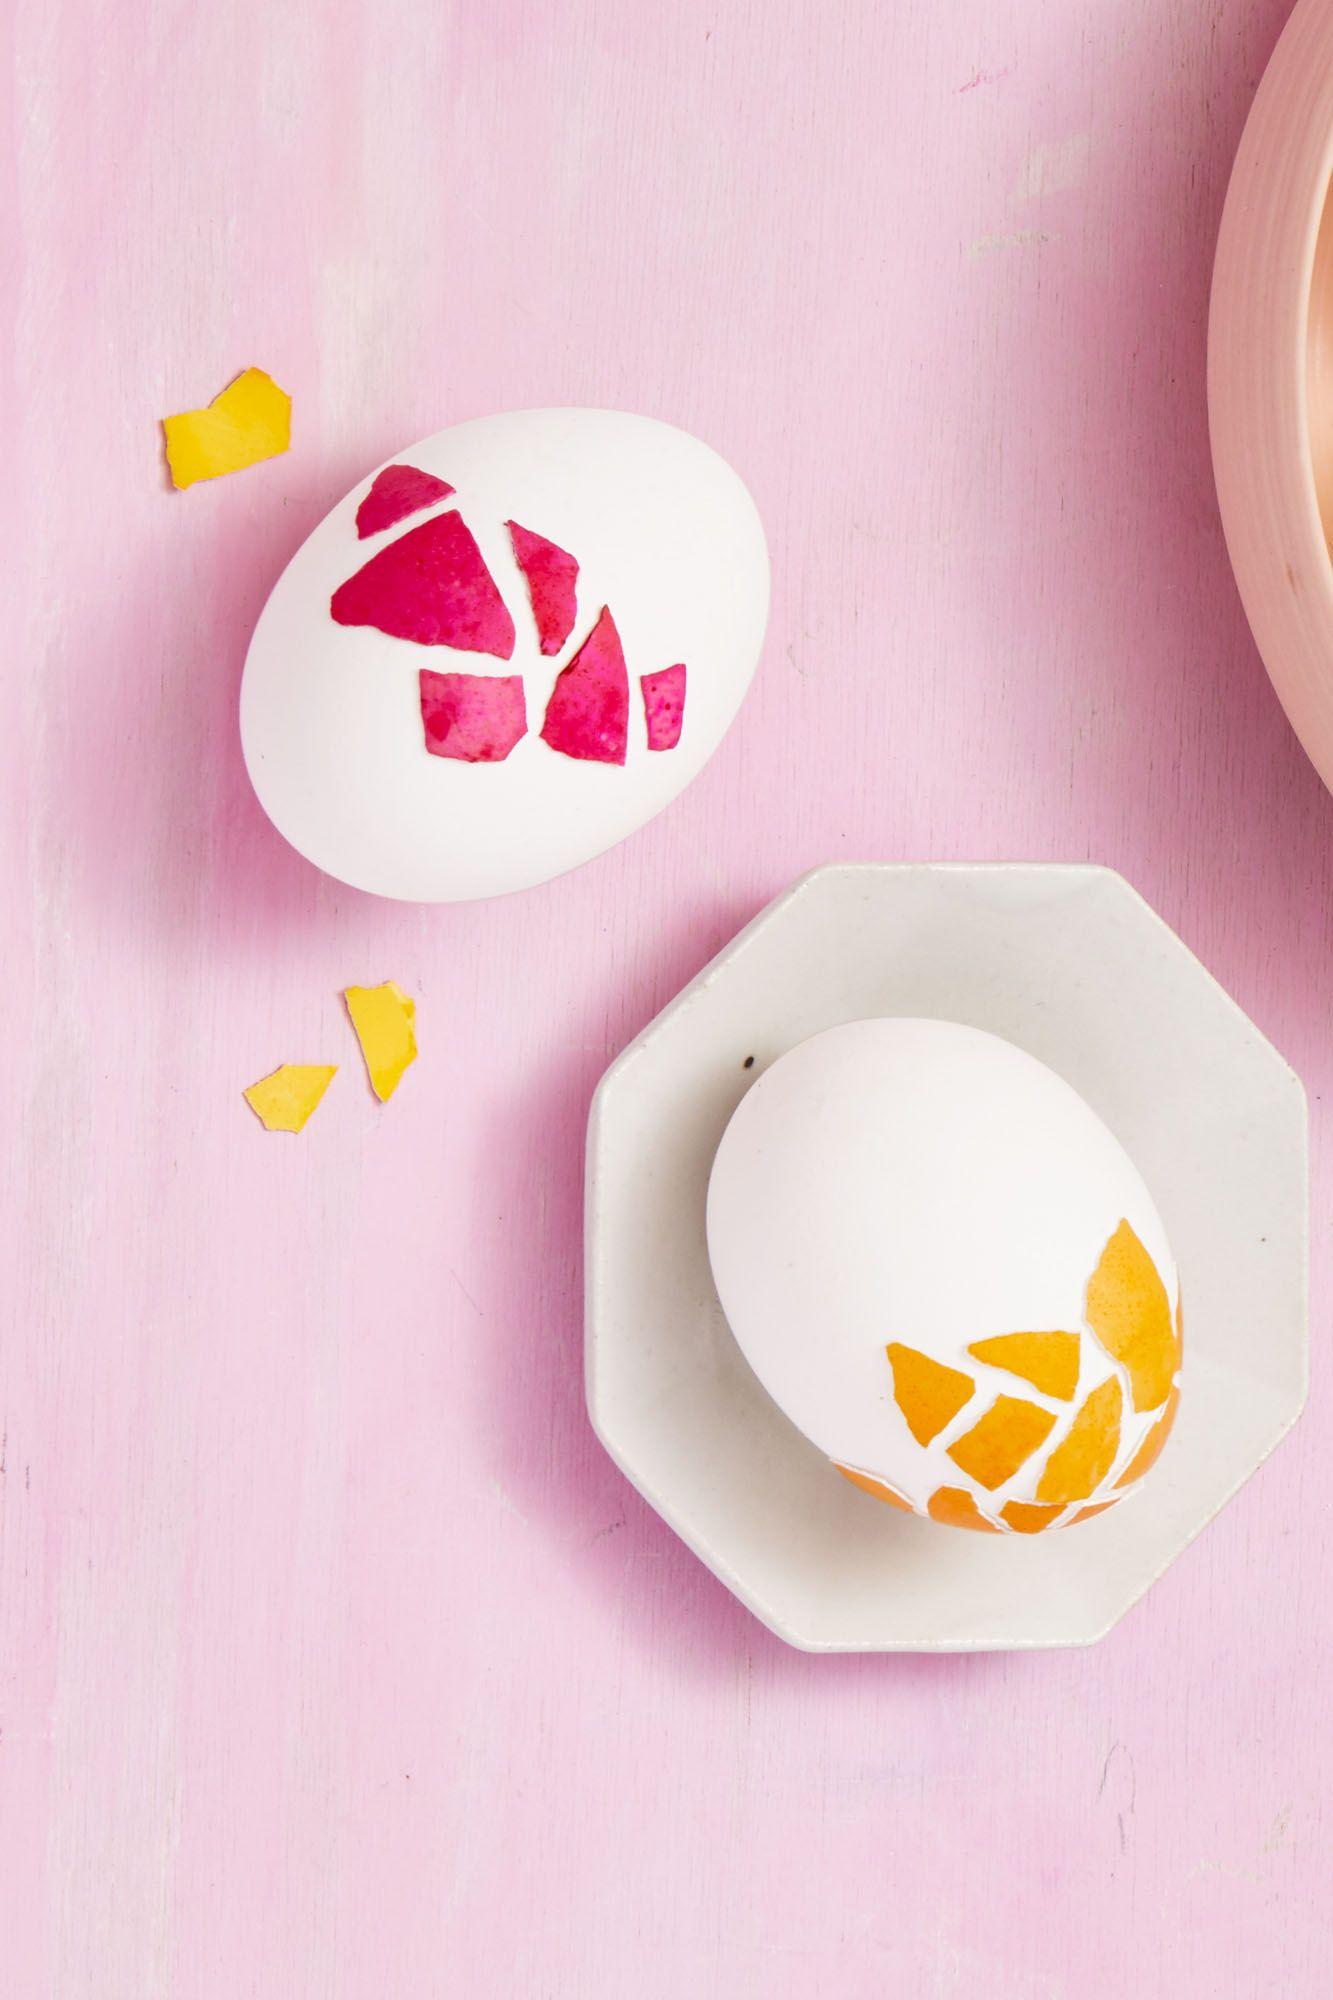 58 Best Easter Egg Designs - Easy DIY Ideas for Easter Egg Decorating